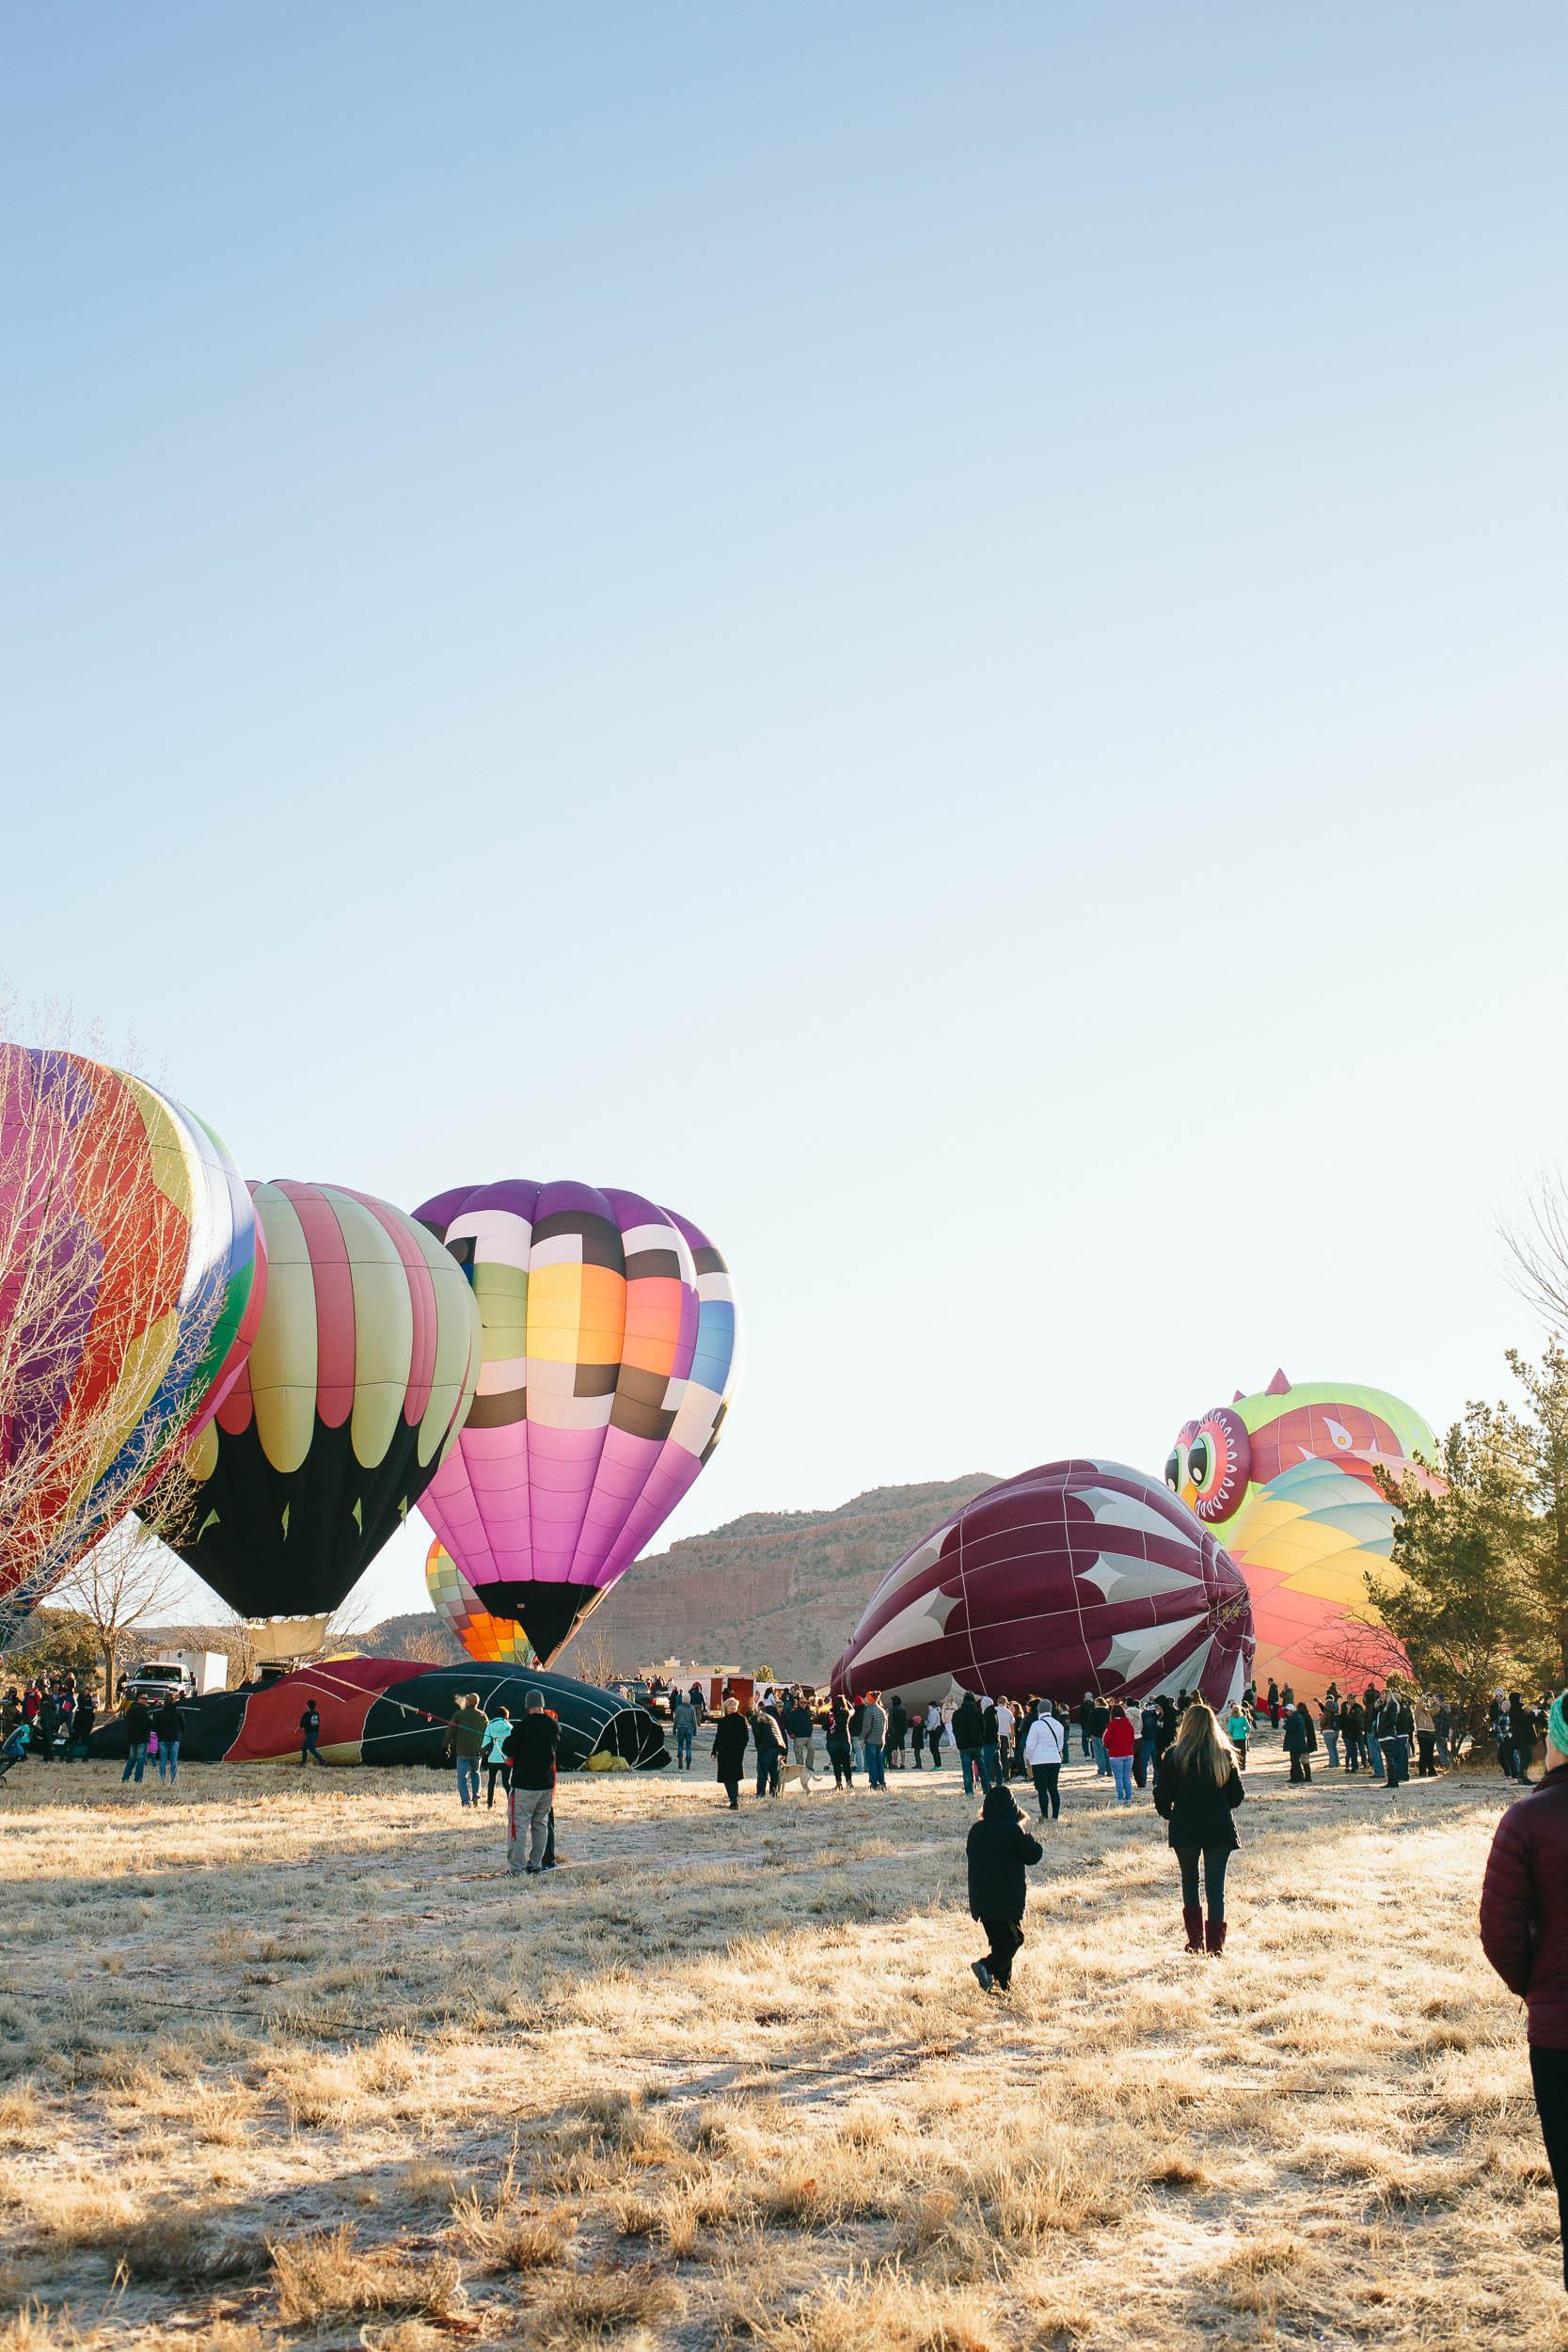 Kyle-Sheppard-Kanab-Balloon-Festival-3.jpg